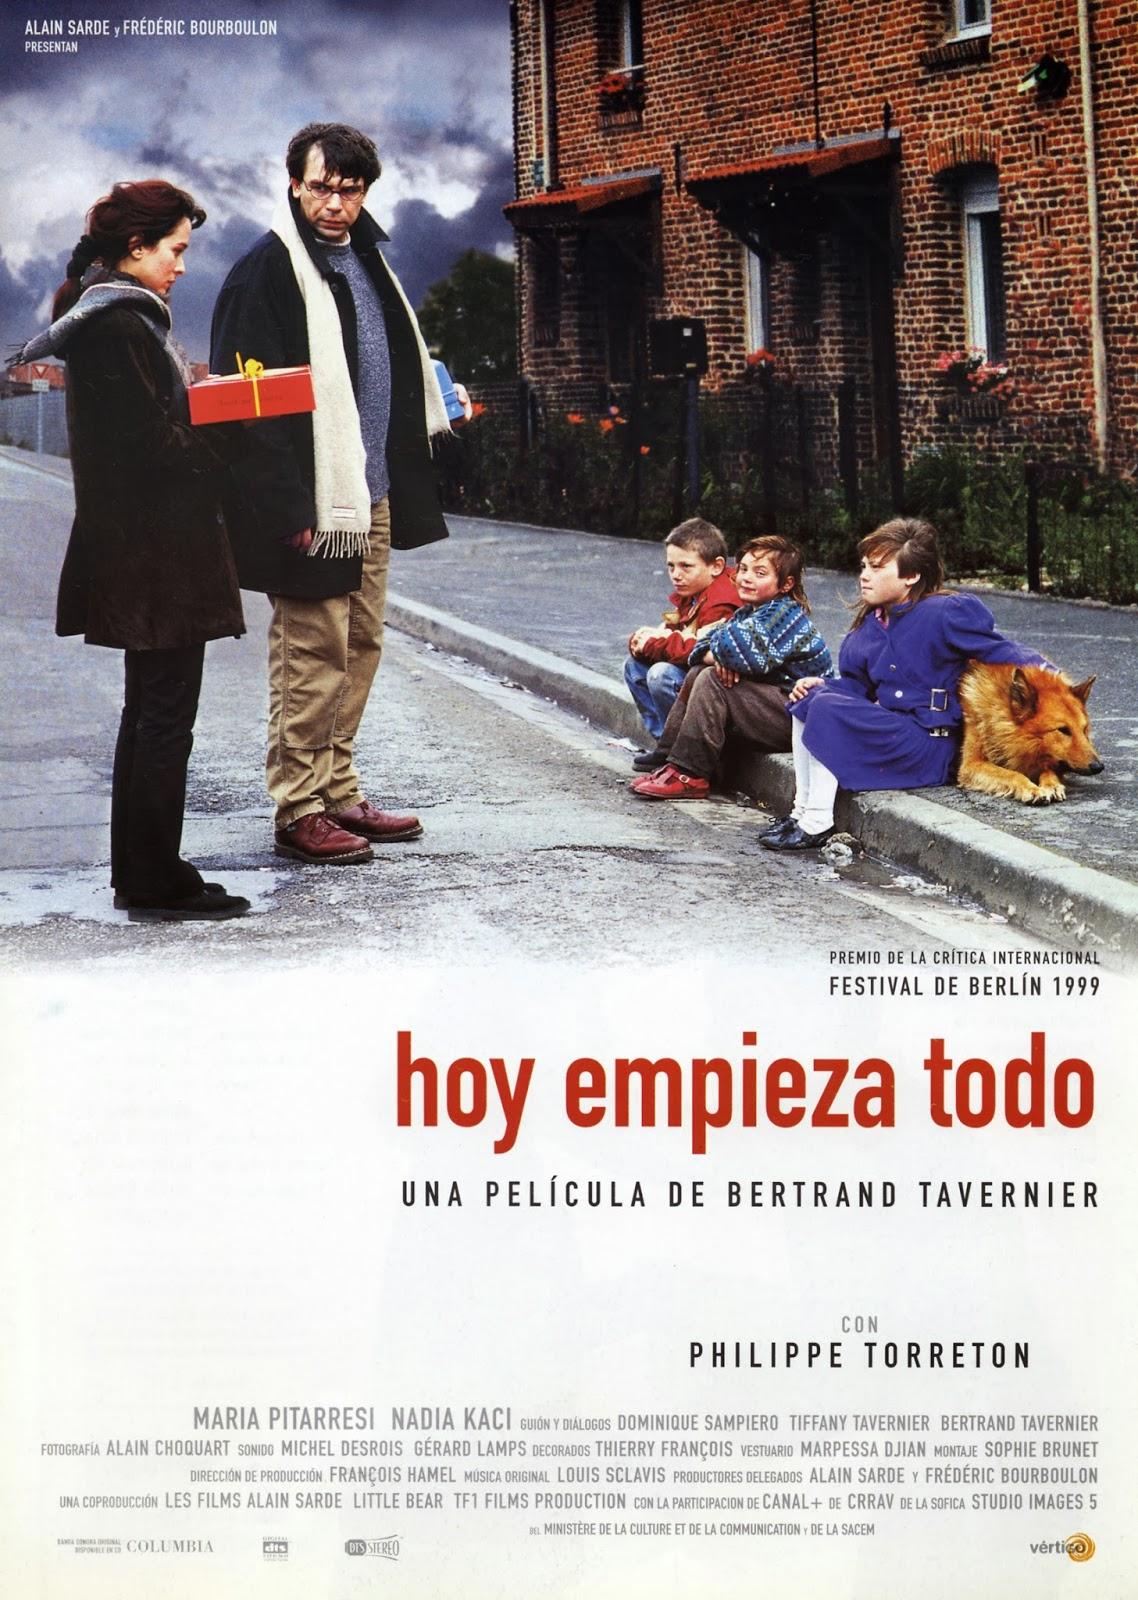 http://descubrepelis.blogspot.com/2012/02/hoy-empieza-todo.html